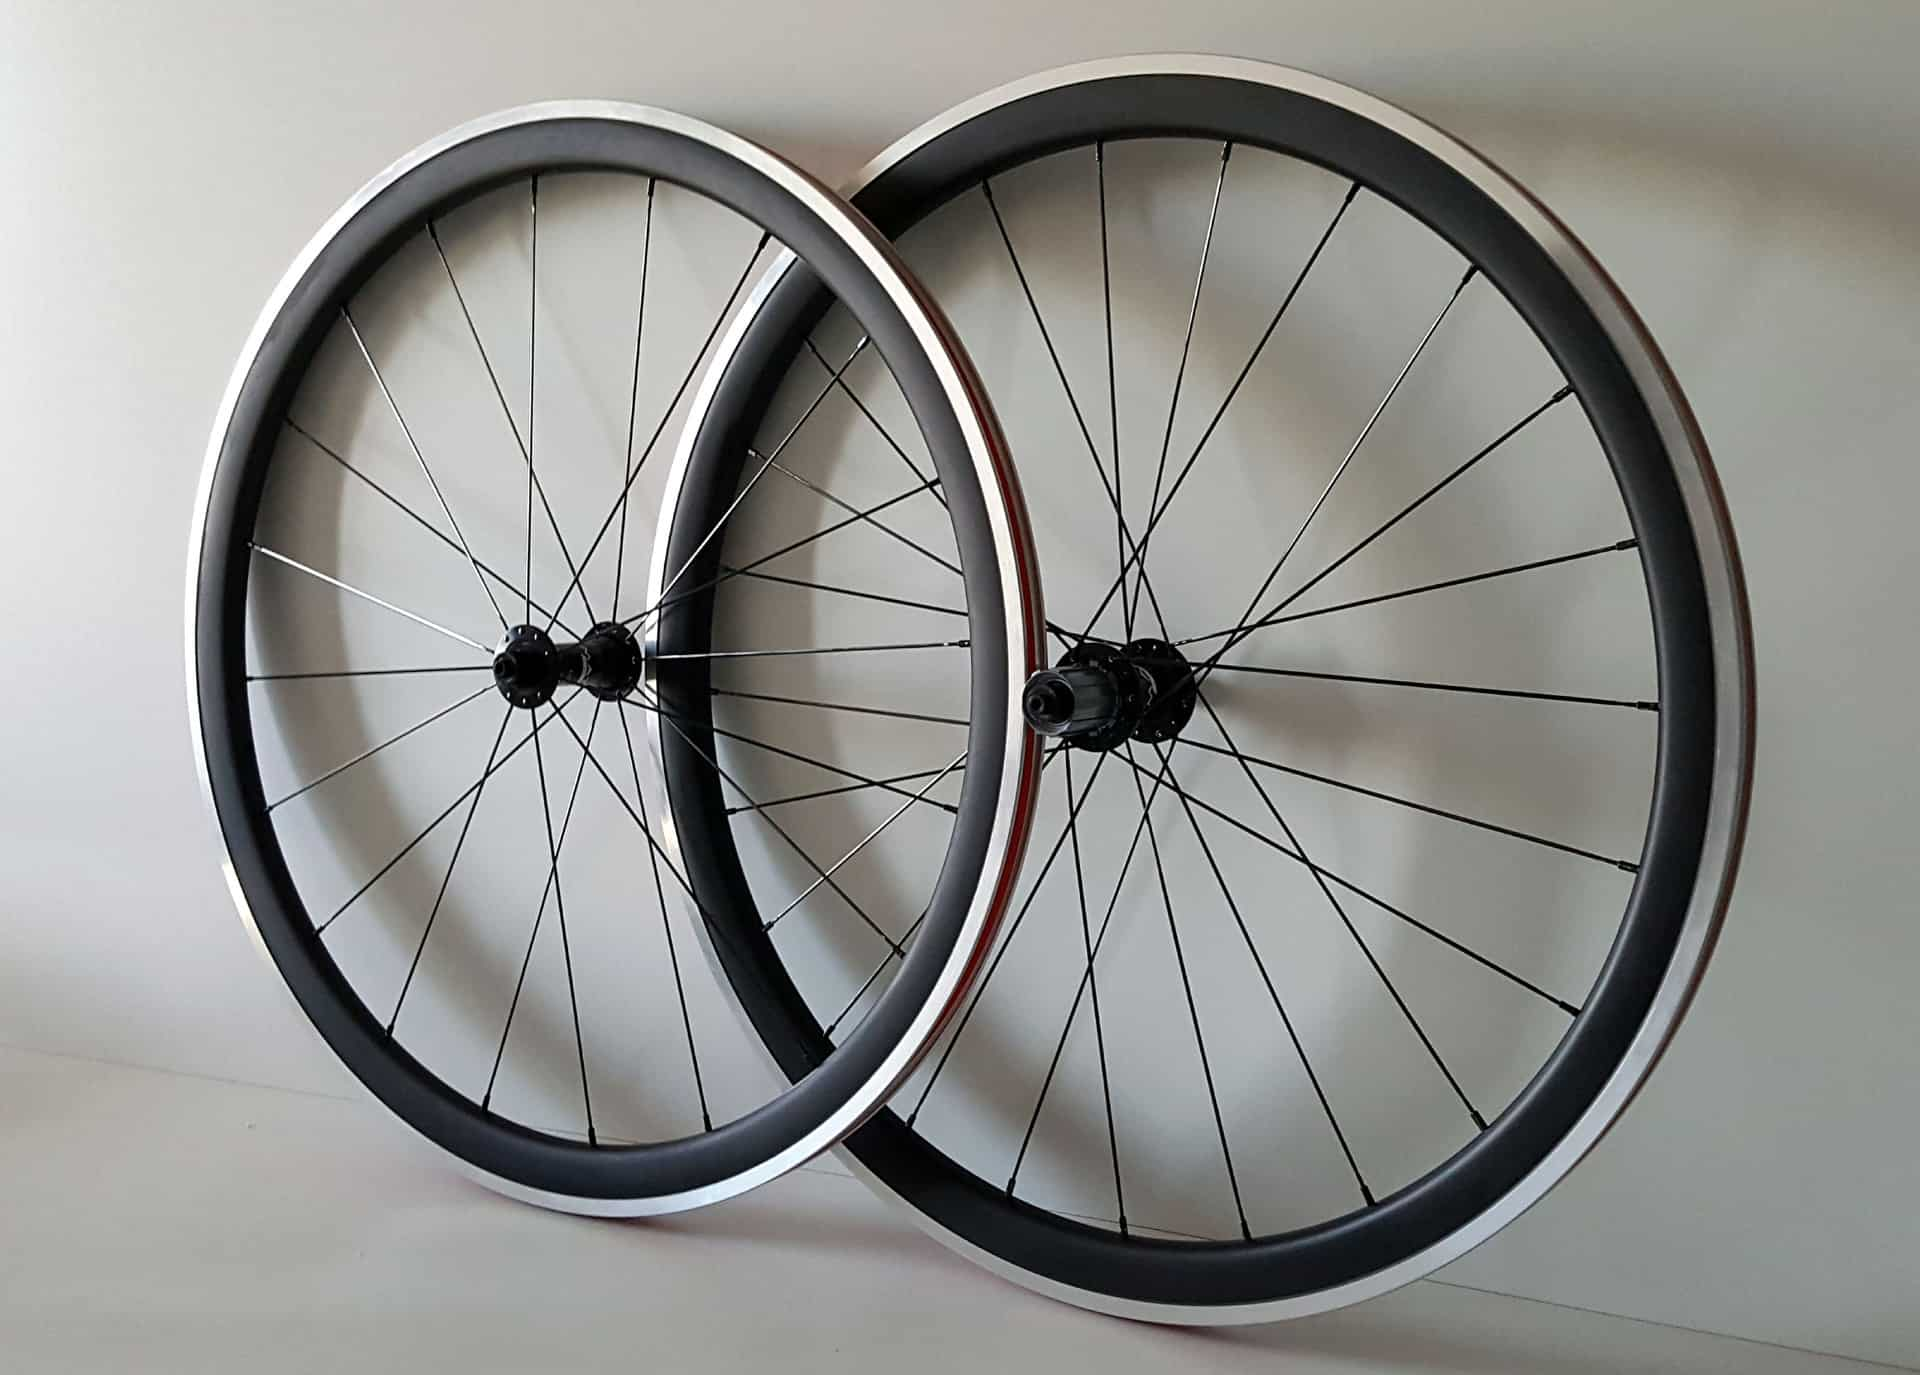 38mm carbon wielen met aluminium remrand en zonder logo